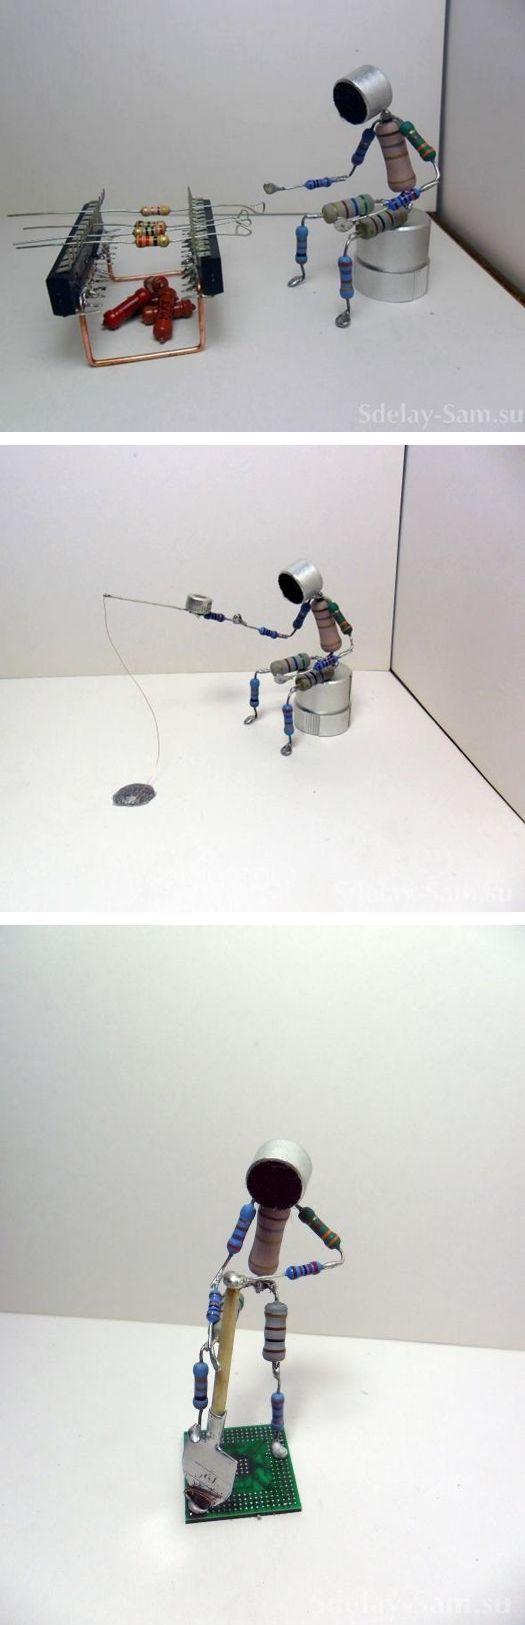 2-elektronik-gorsel-komponentler-rerim-figur-electronic-art-photo